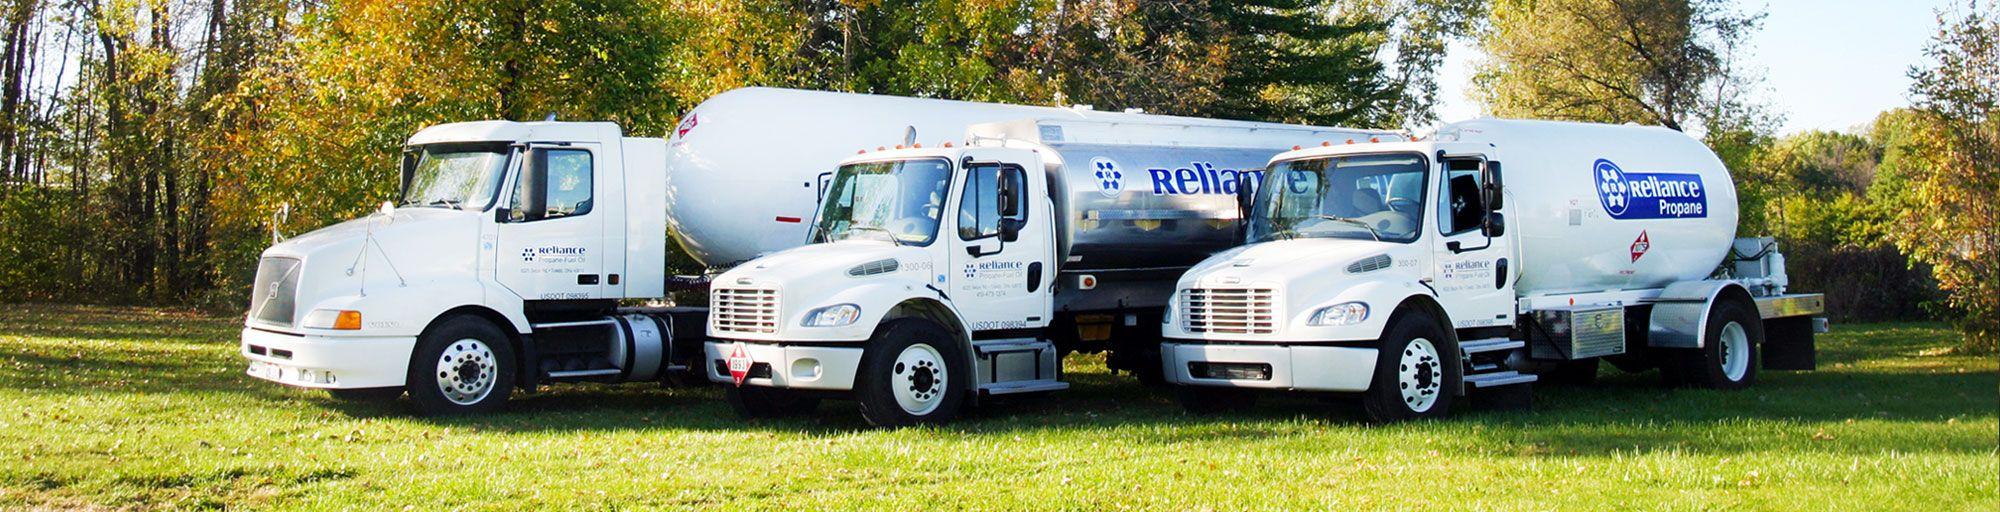 Reliance Fuel Delivery Fleet